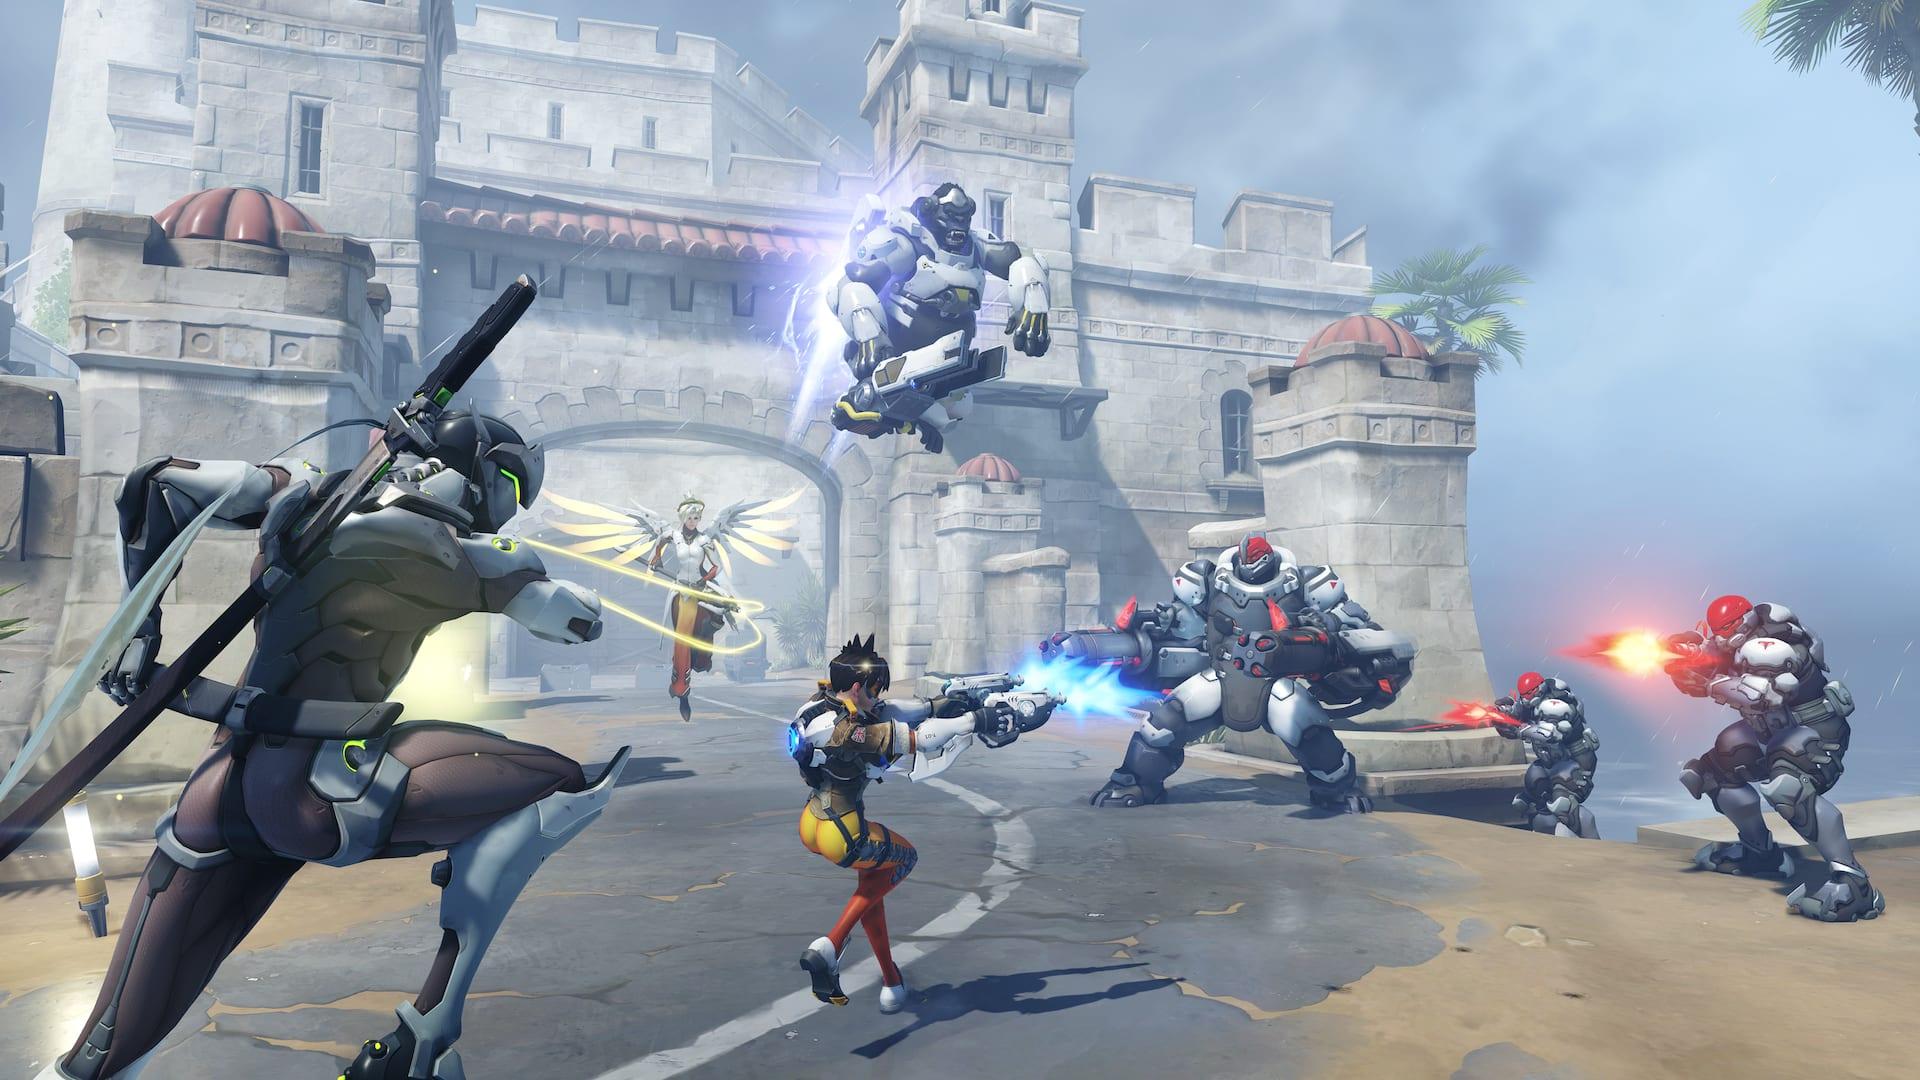 Jeff Kaplan Details Storm Rising Mission in Overwatch Developer Update